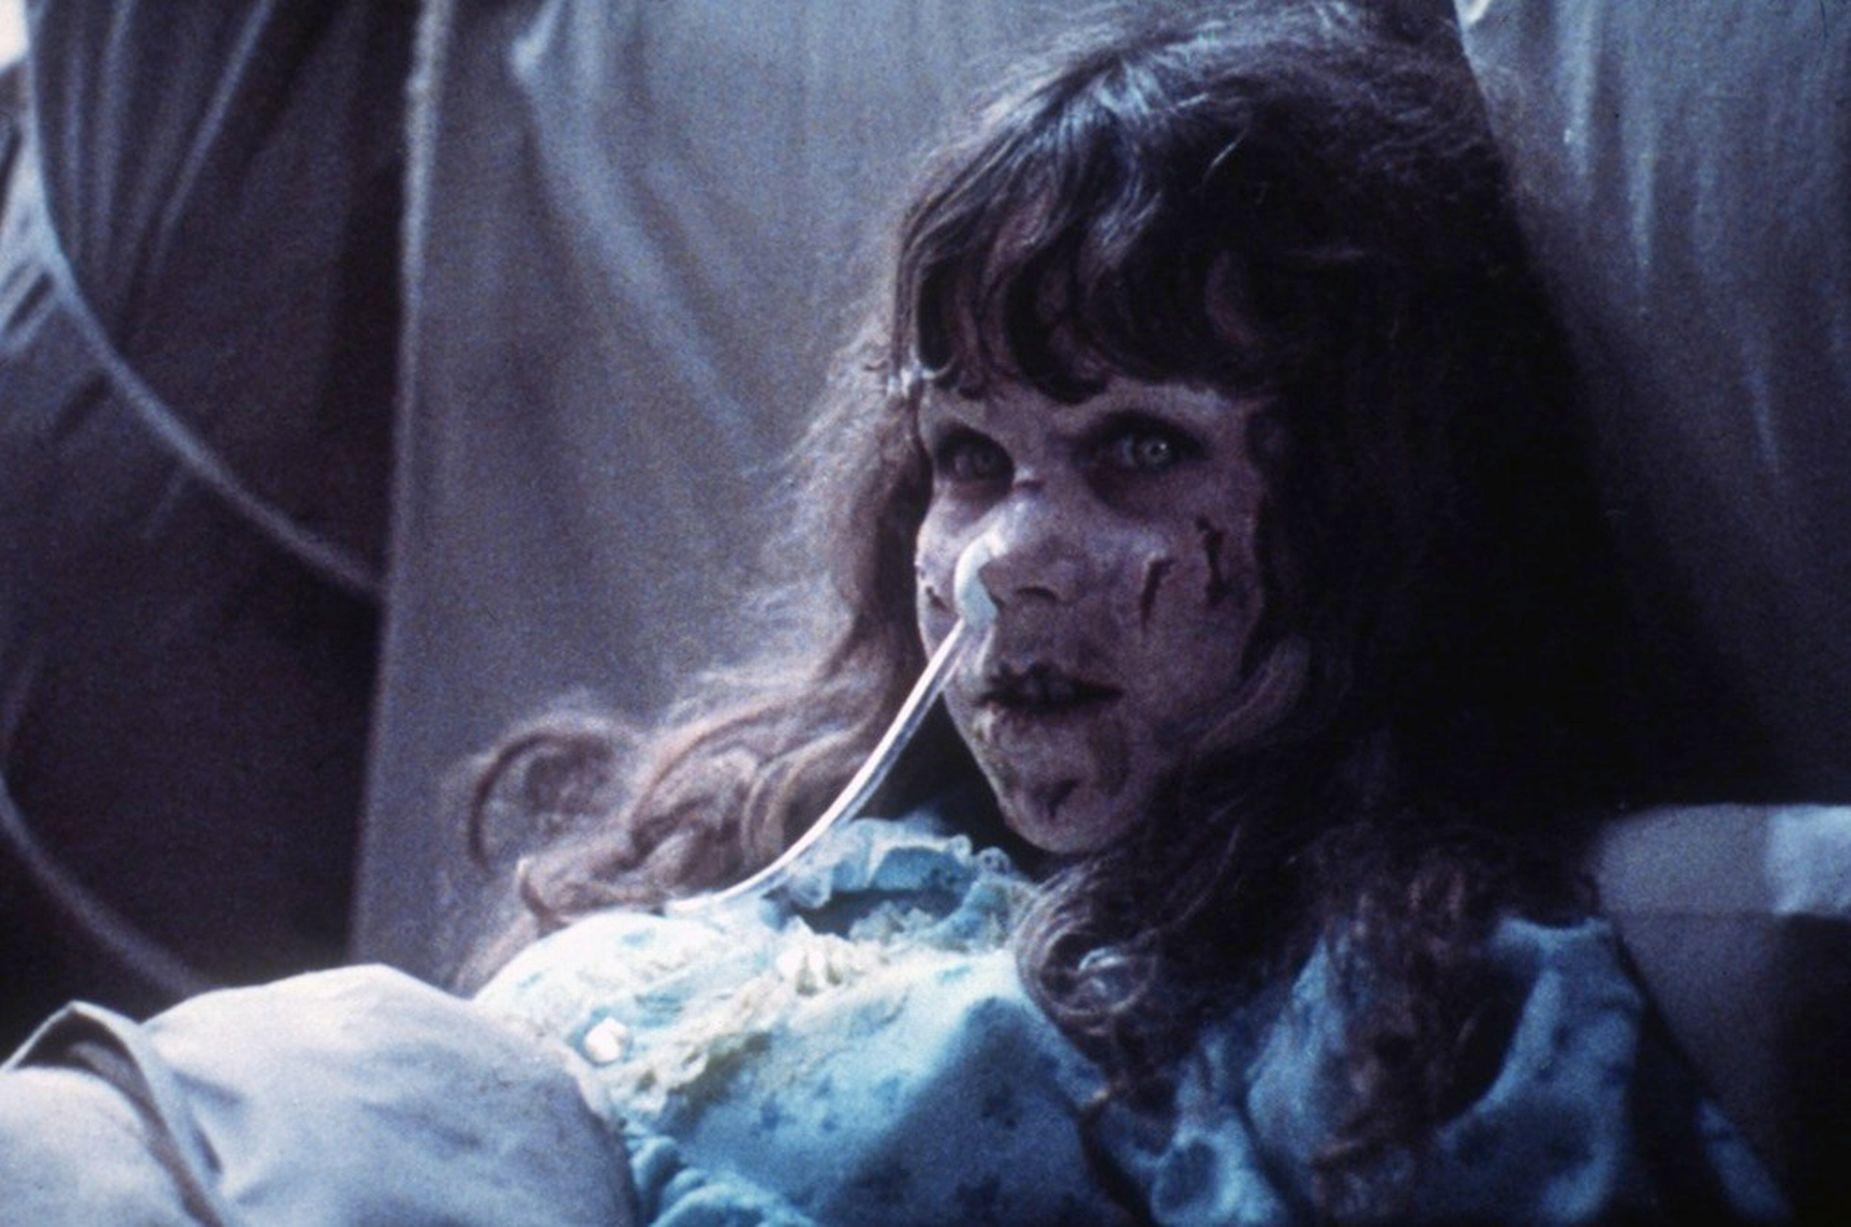 Výsledek obrázku pro the exorcist